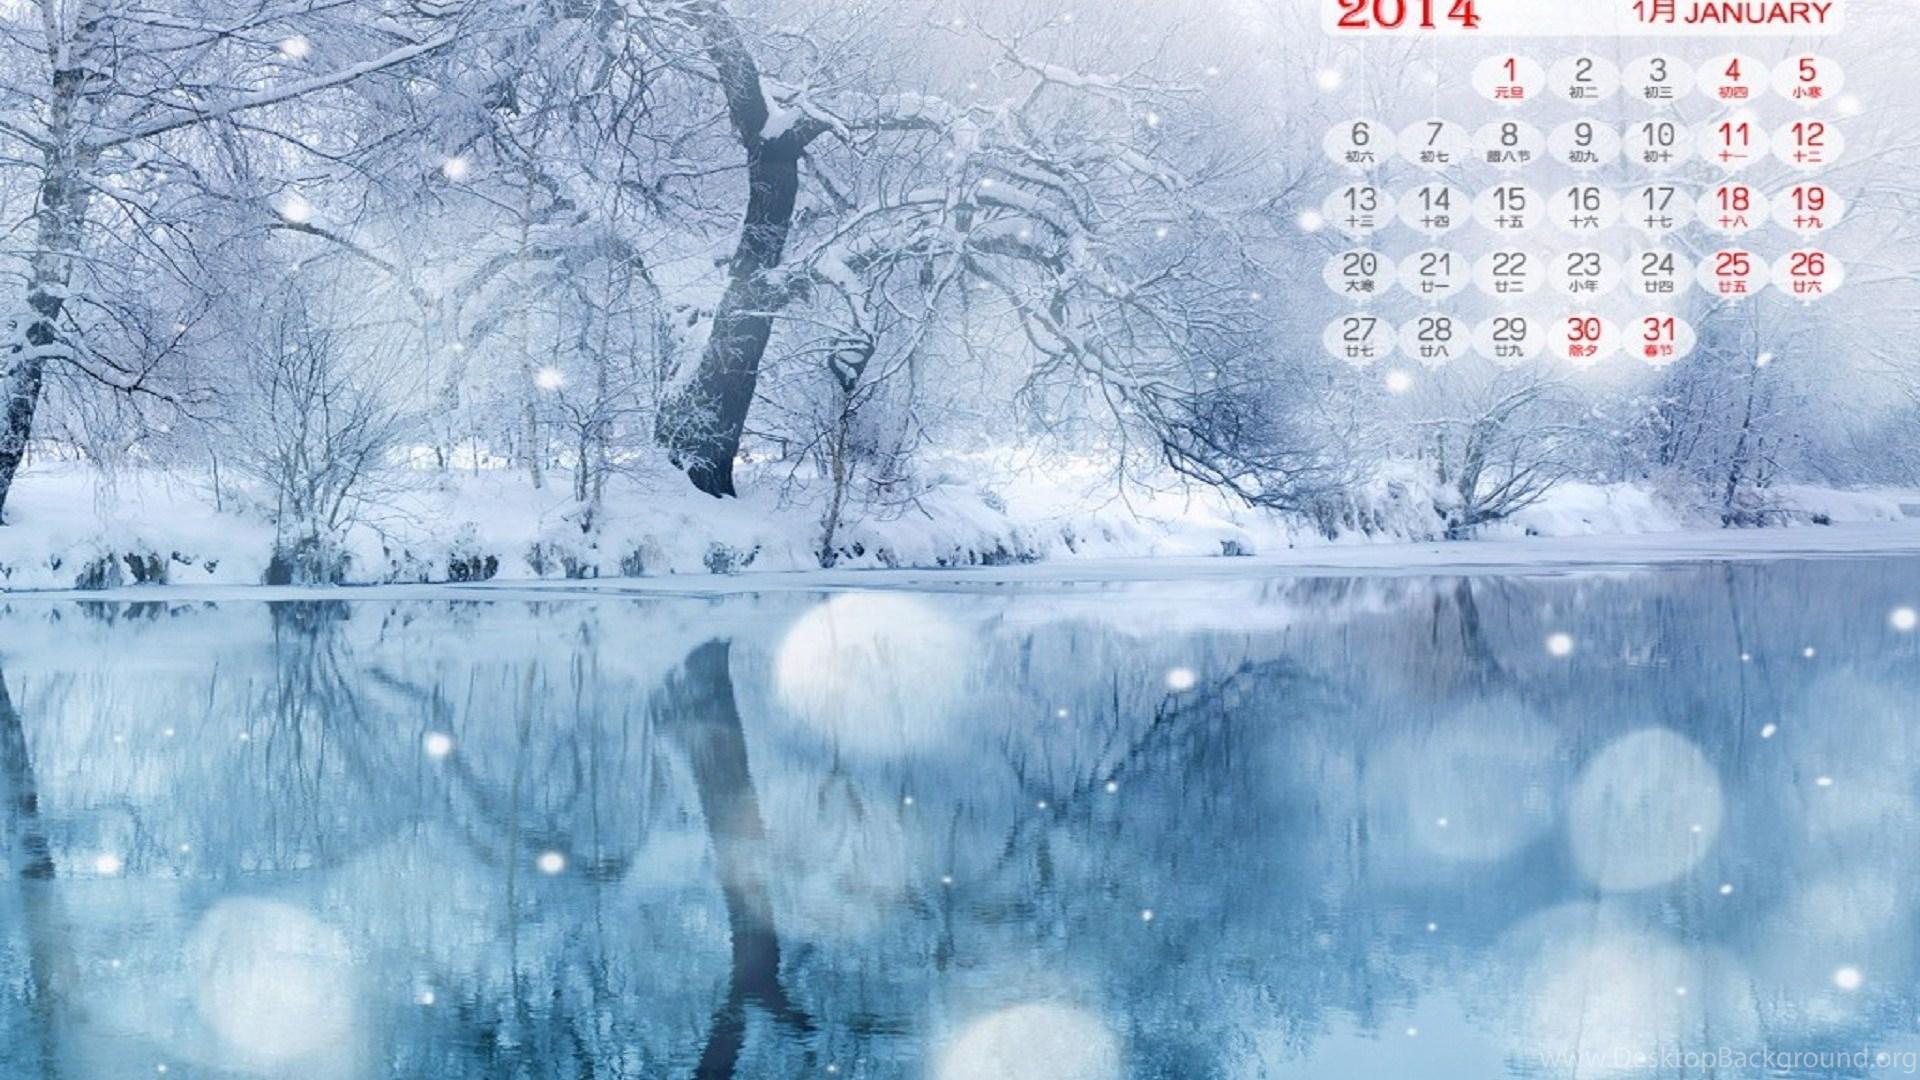 January Desktop Backgrounds Widescreen HD Wallpapers ...